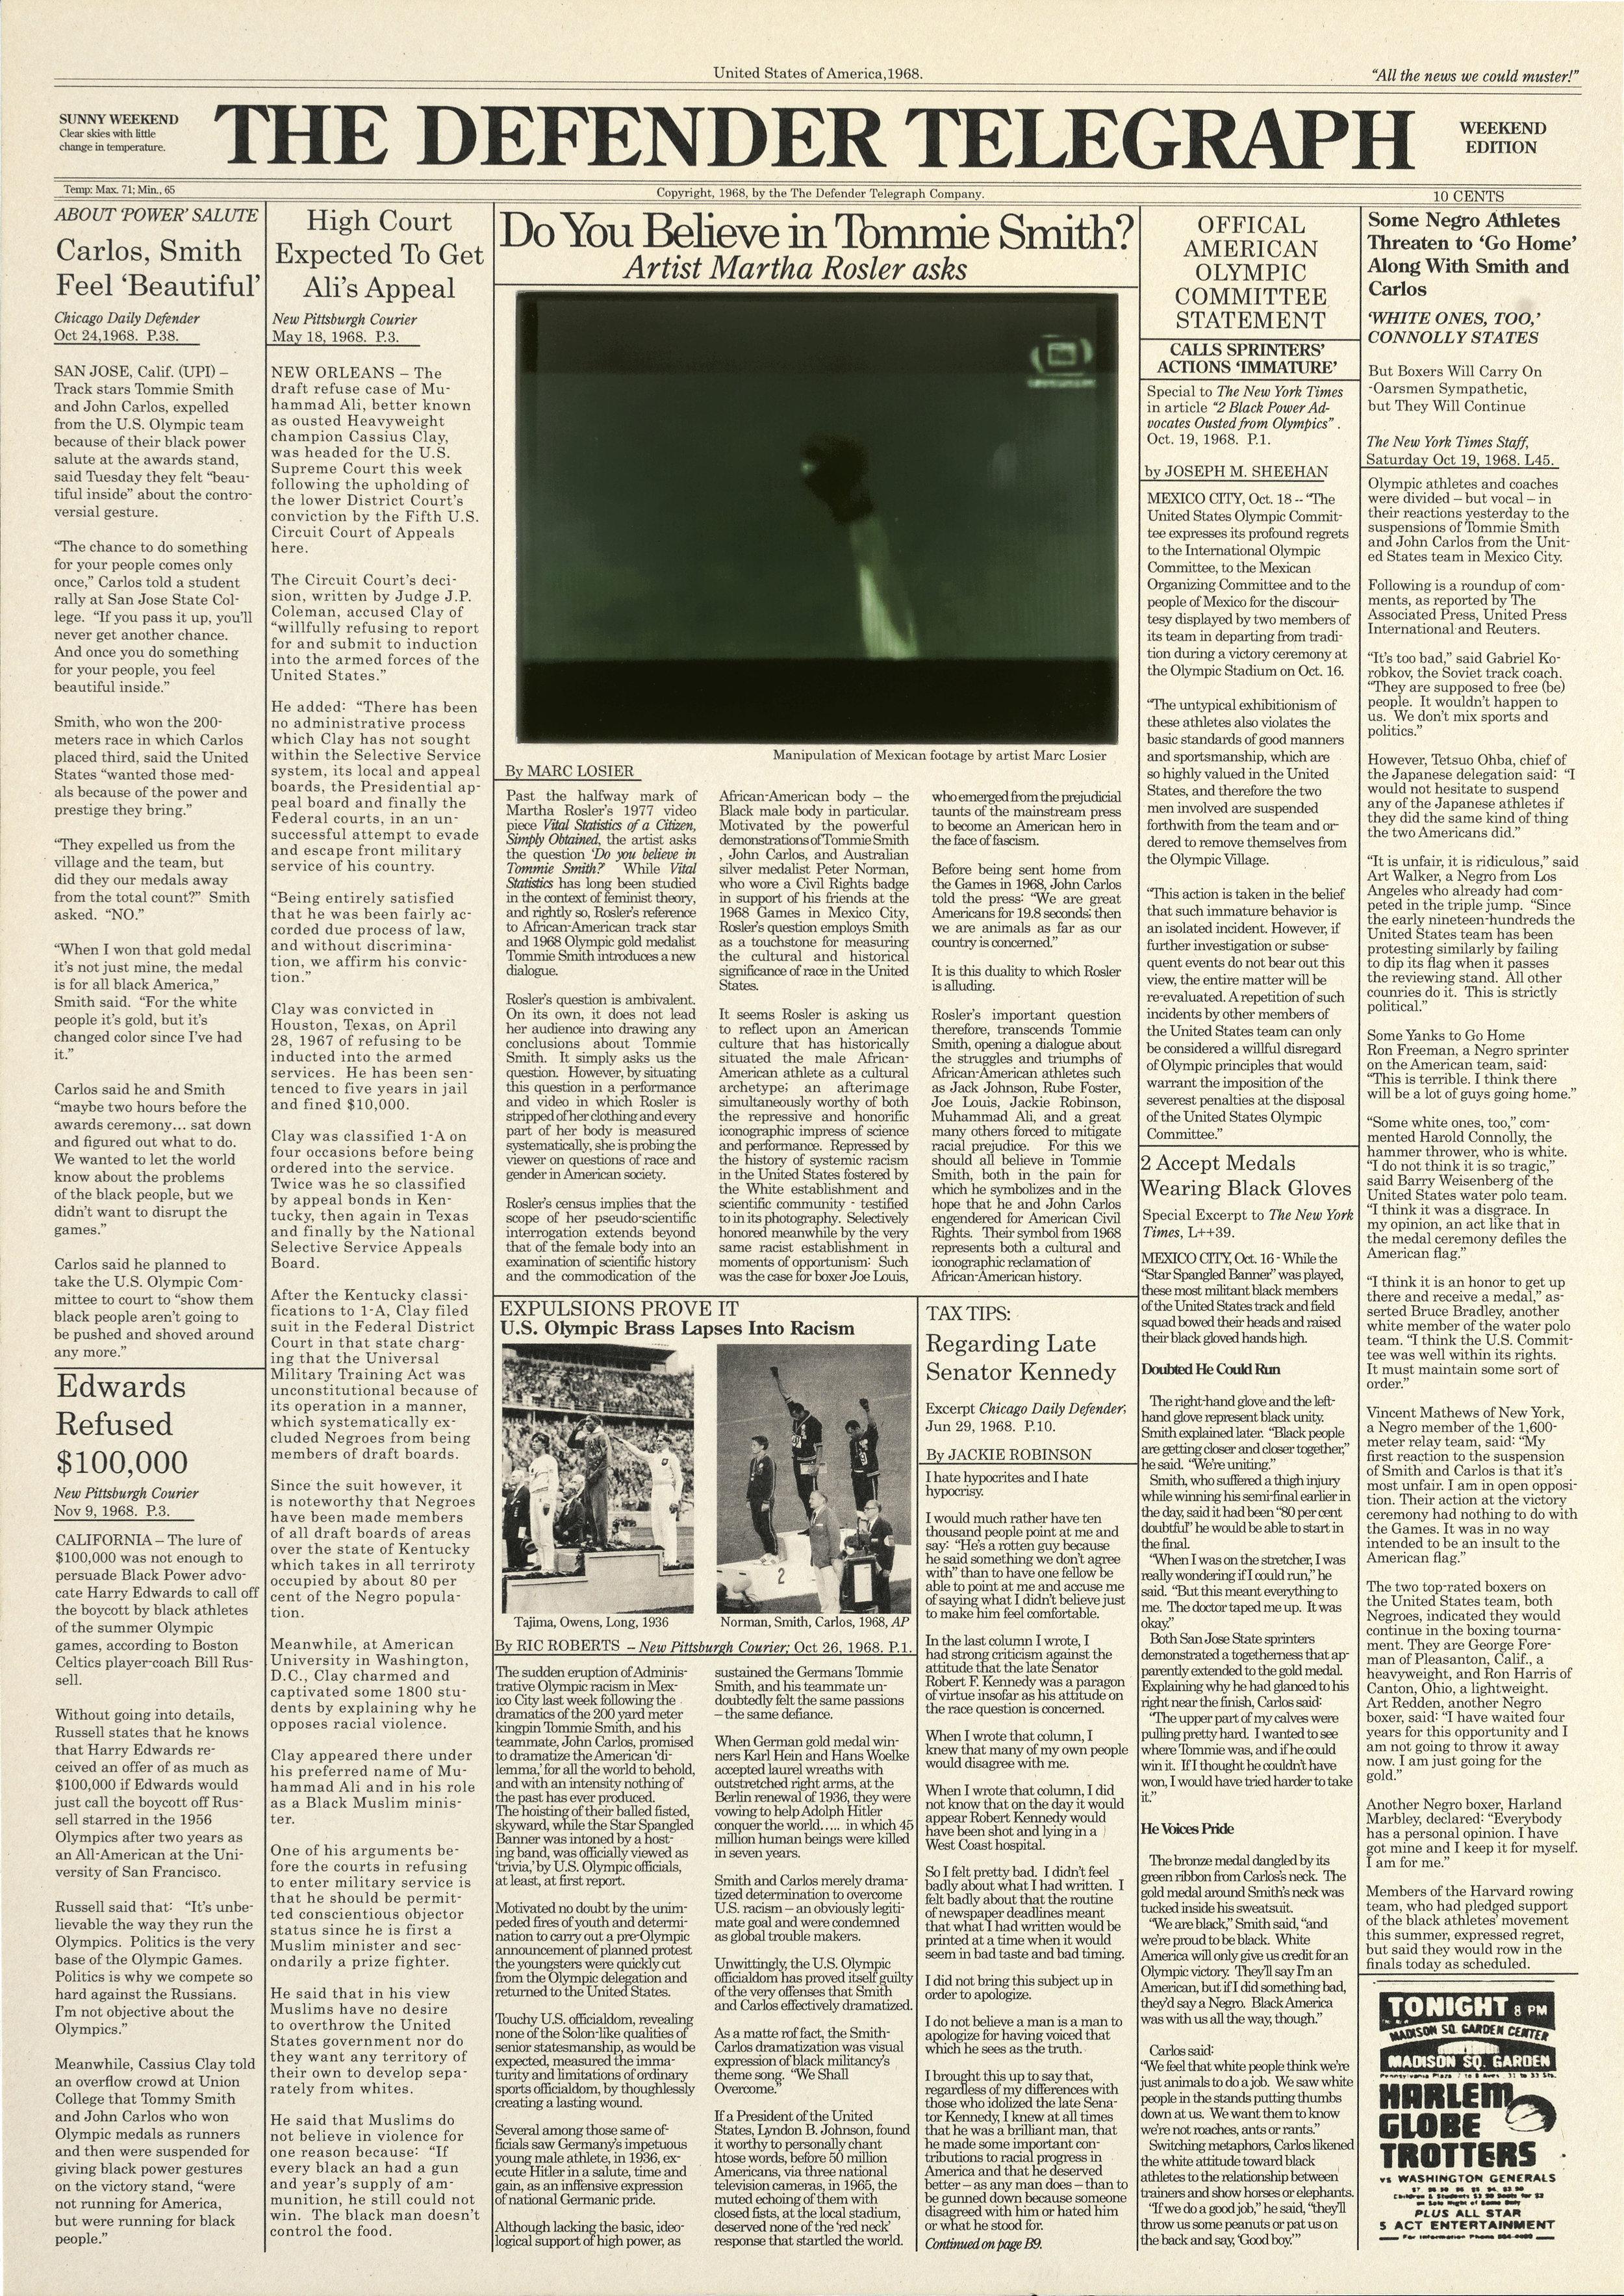 The Defender Telegraph 1968, 2010